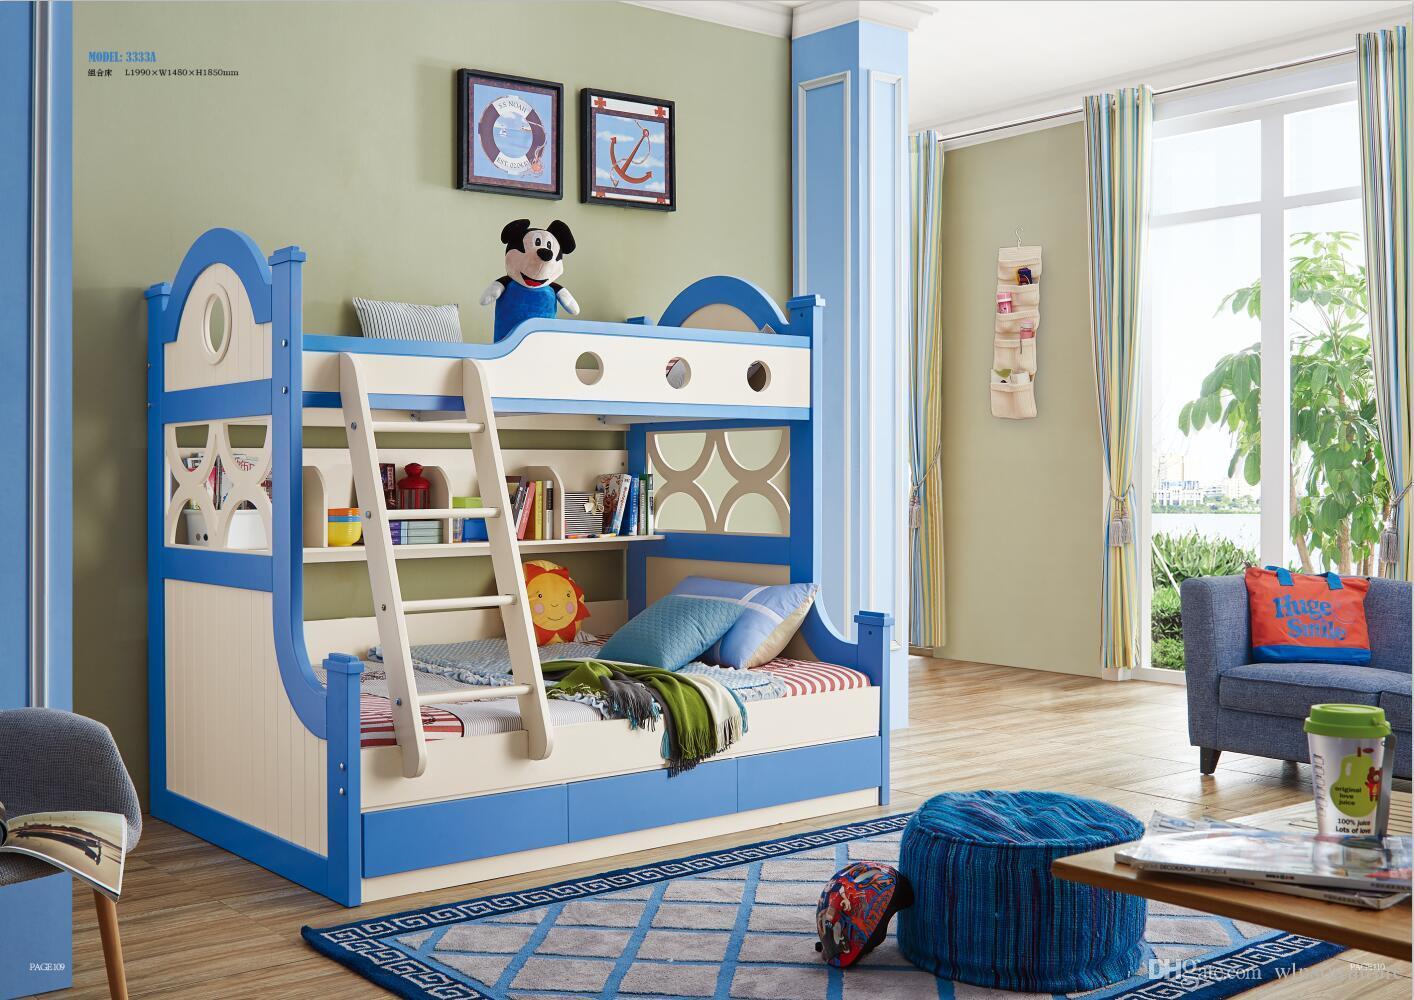 Etagenbett Puppe : Großhandel eschenholz kinder schlafzimmermöbel massivholz kinderbett